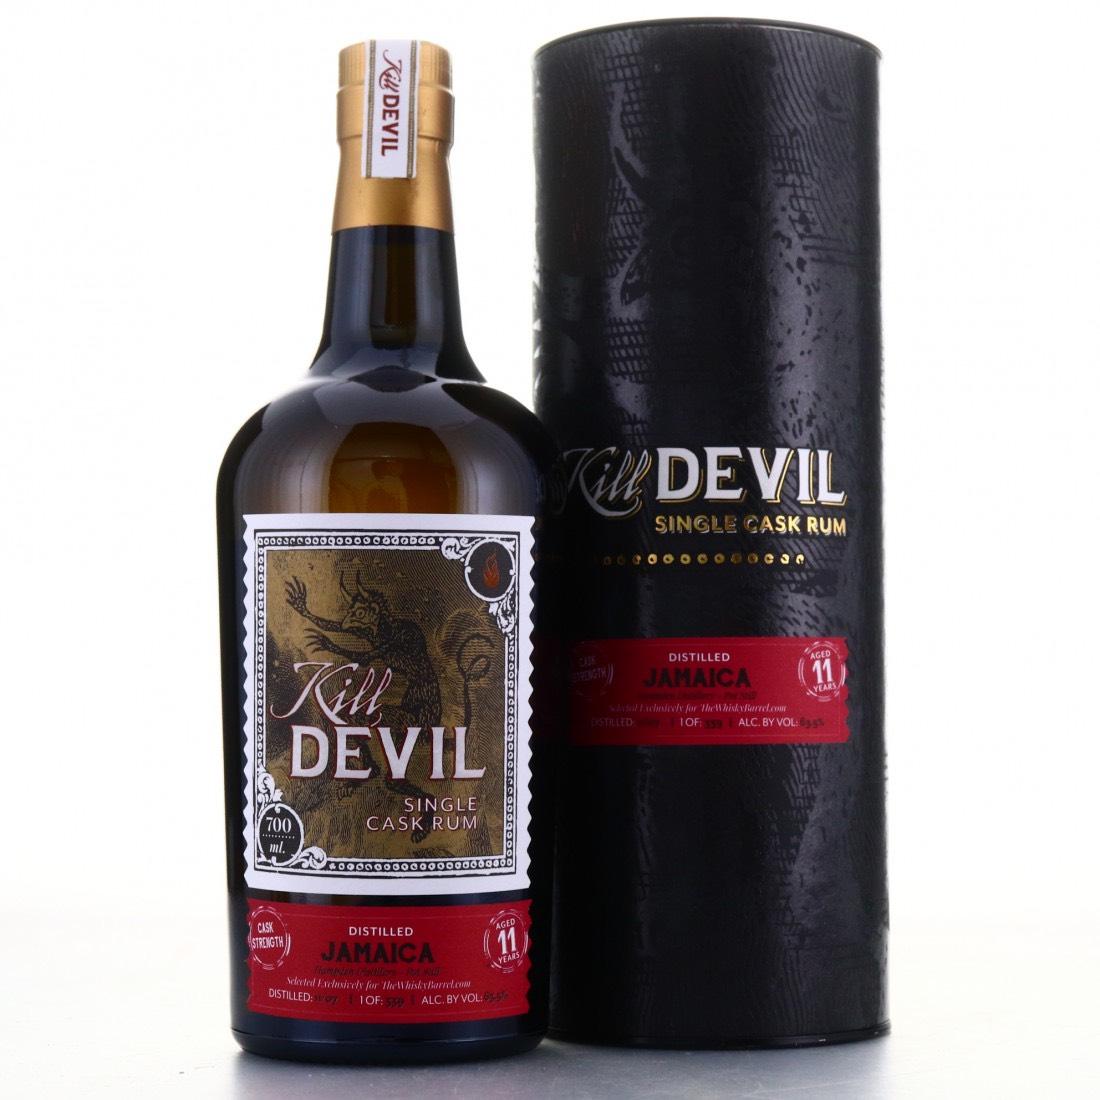 Bottle image of Kill Devil (The Whisky Barrel) C<>H